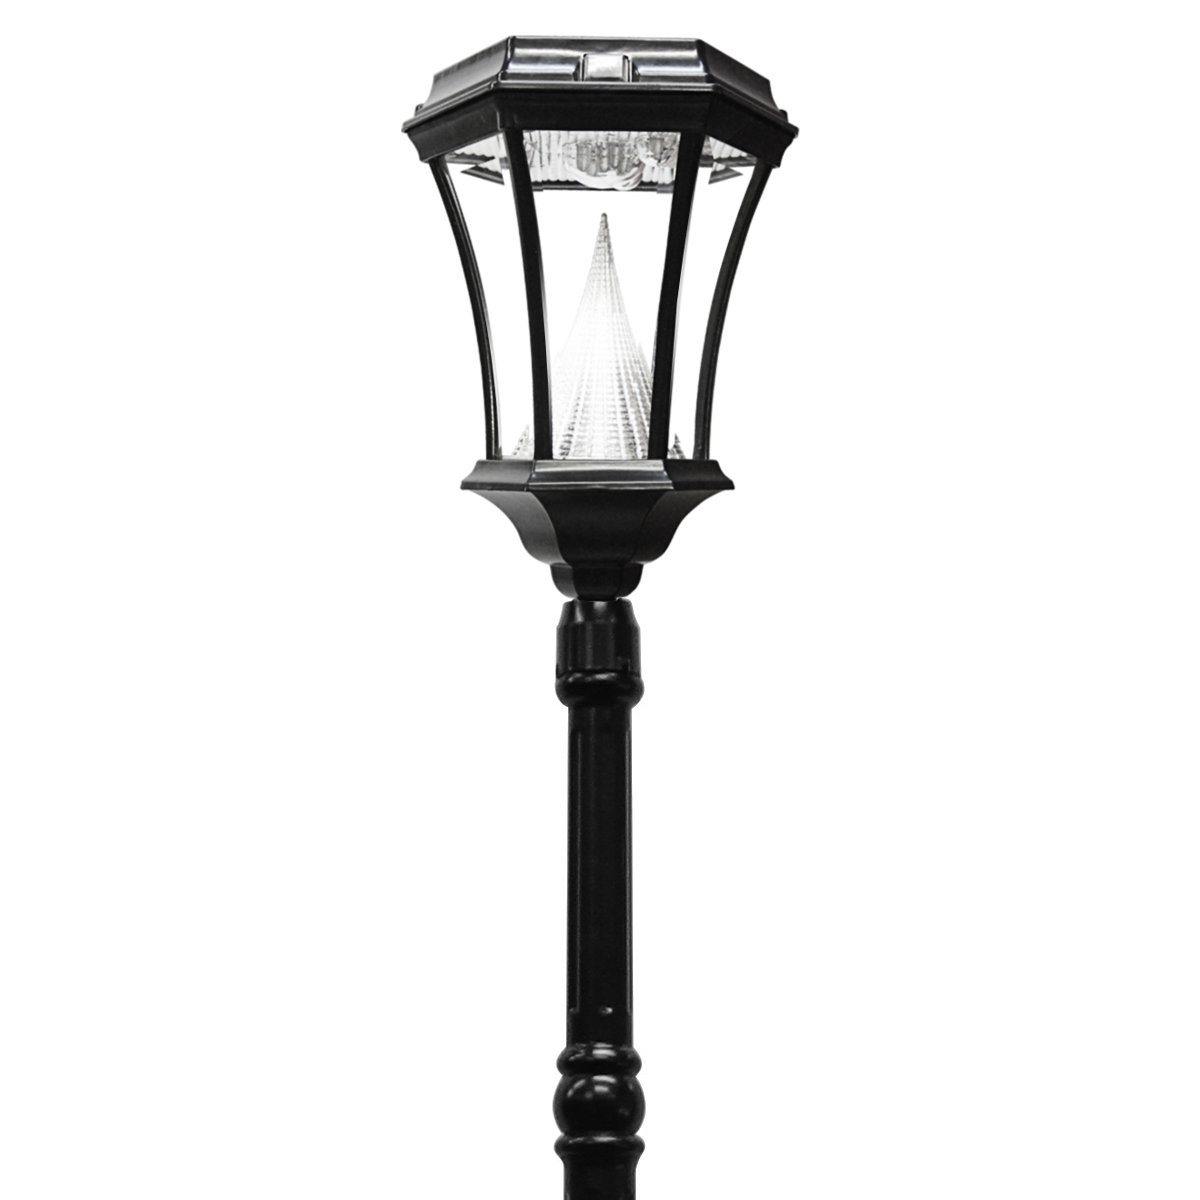 Amazon.com : Gama Sonic Victorian Solar Lamp Post and Single Lamp ...